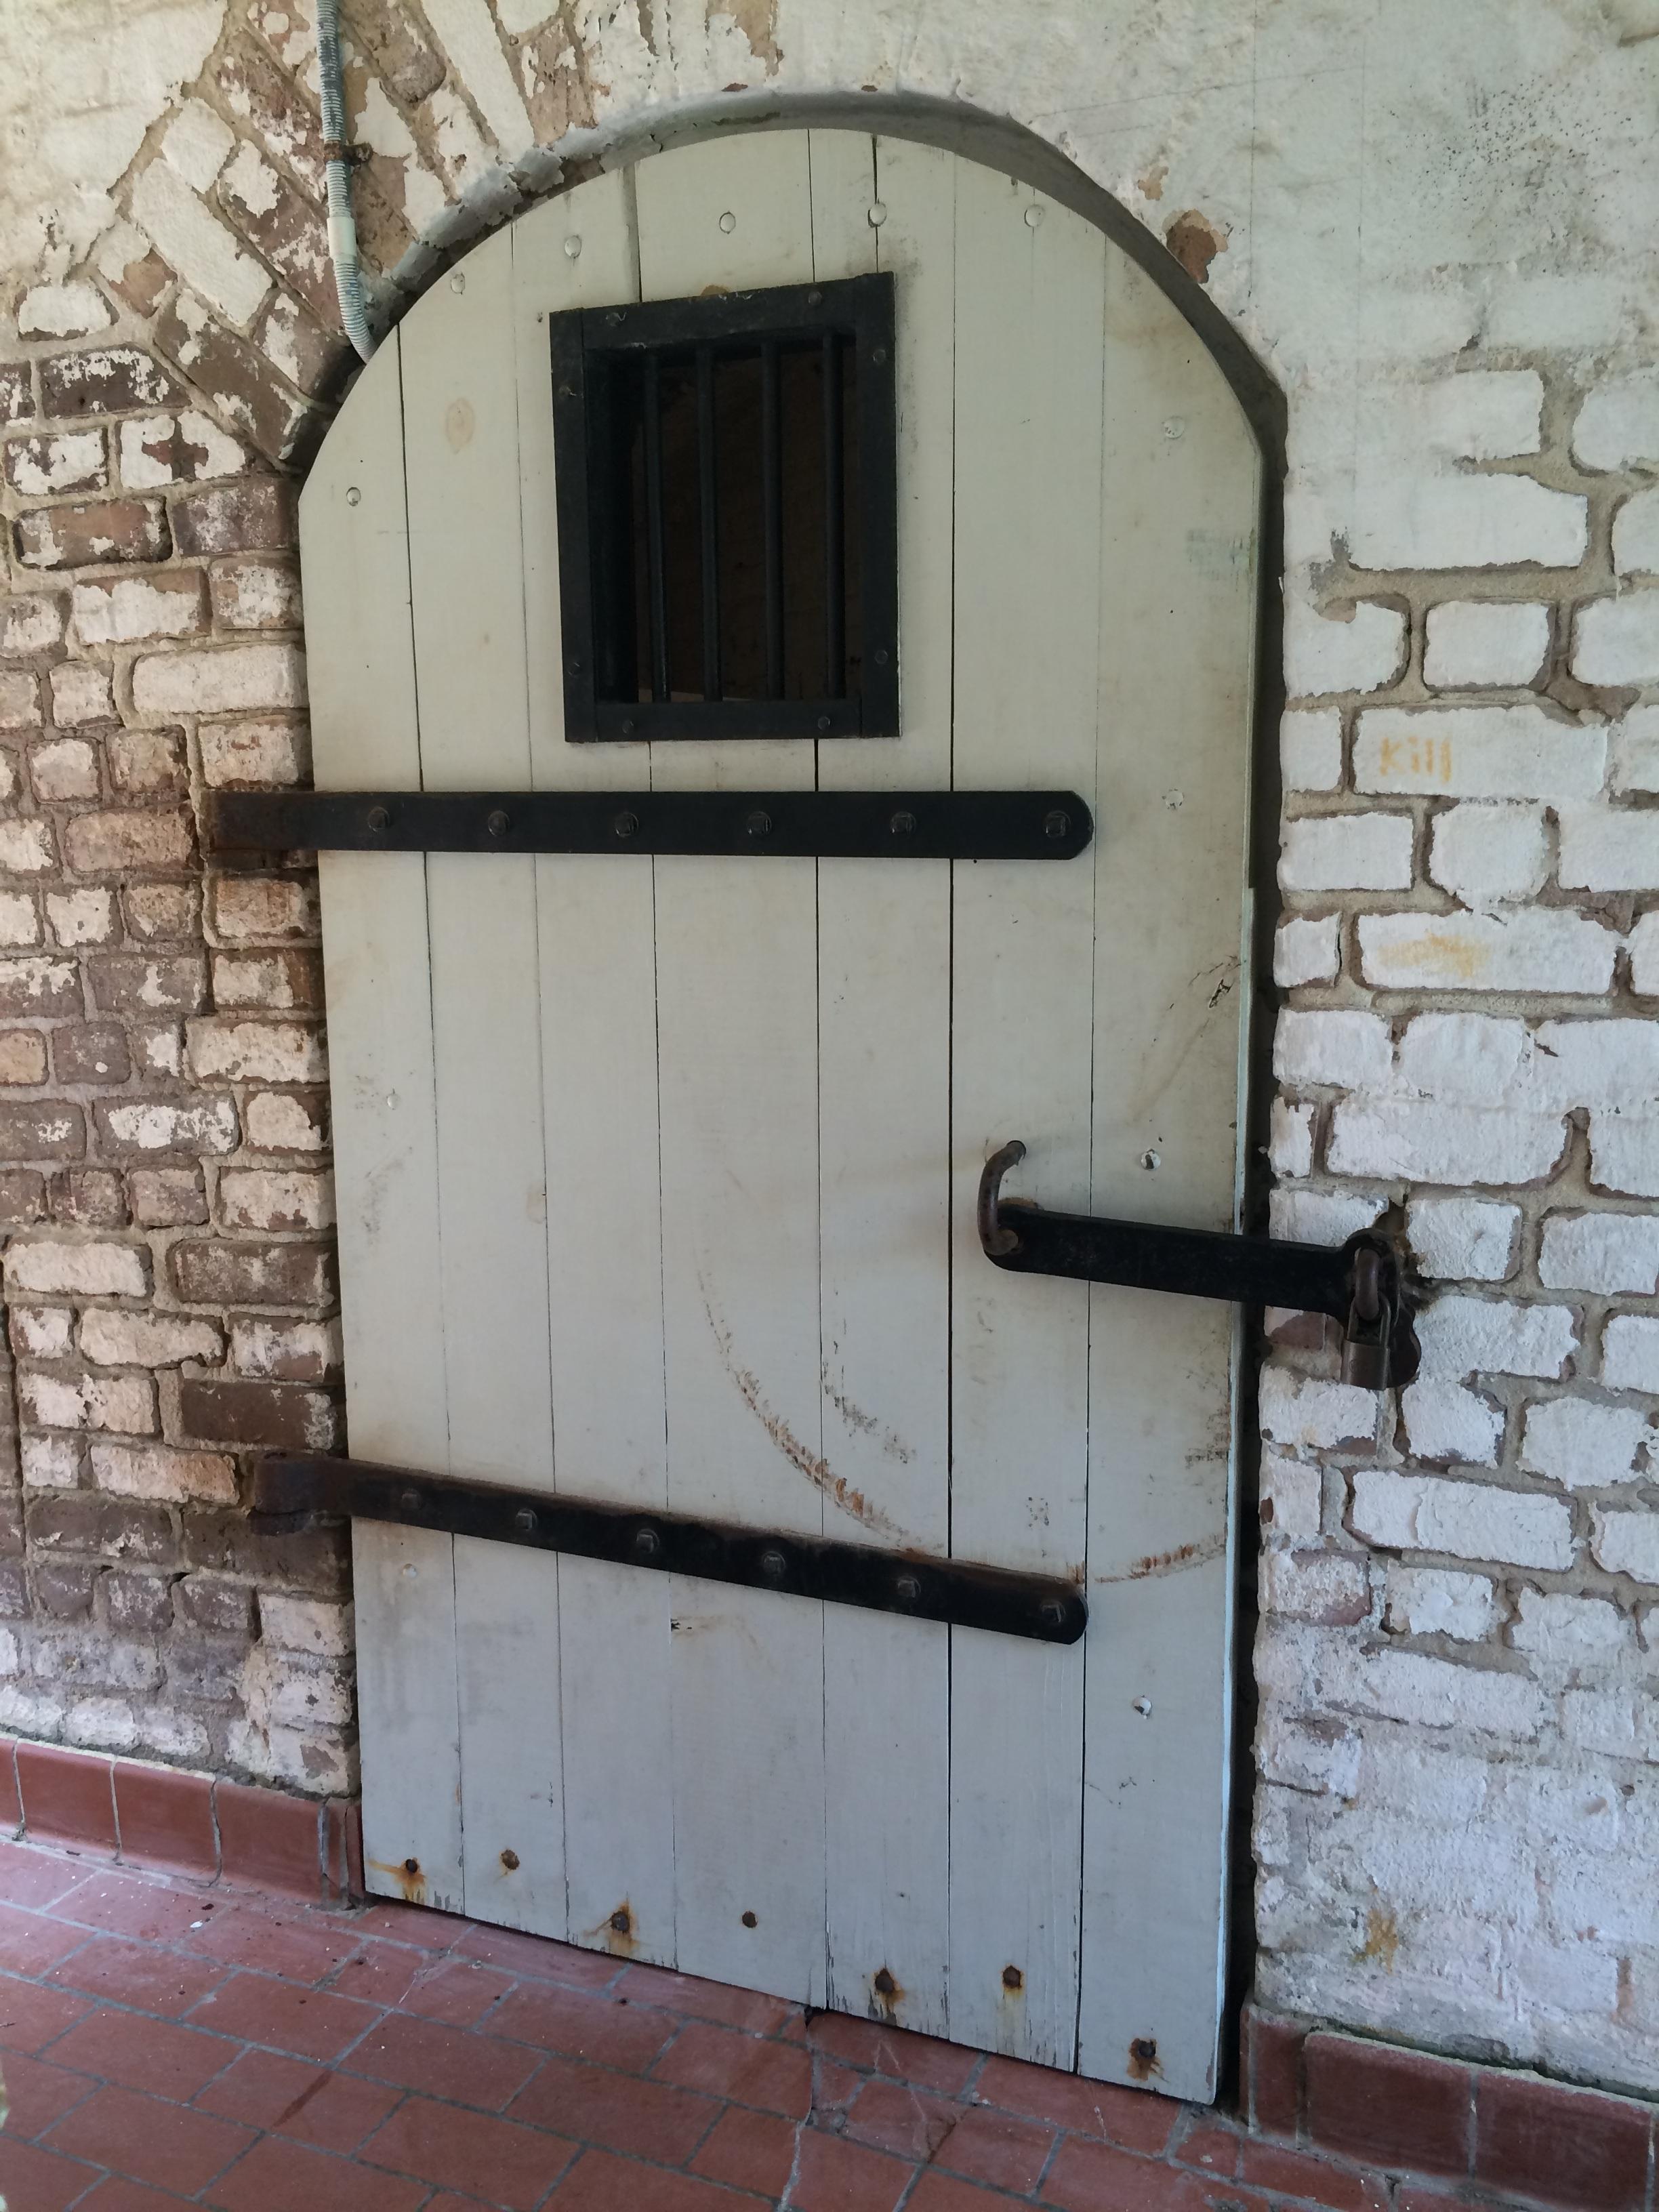 Fotos Gratis Arquitectura Vendimia Antiguo Casa Textura  ~ Puertas Hierro Exterior Fachadas